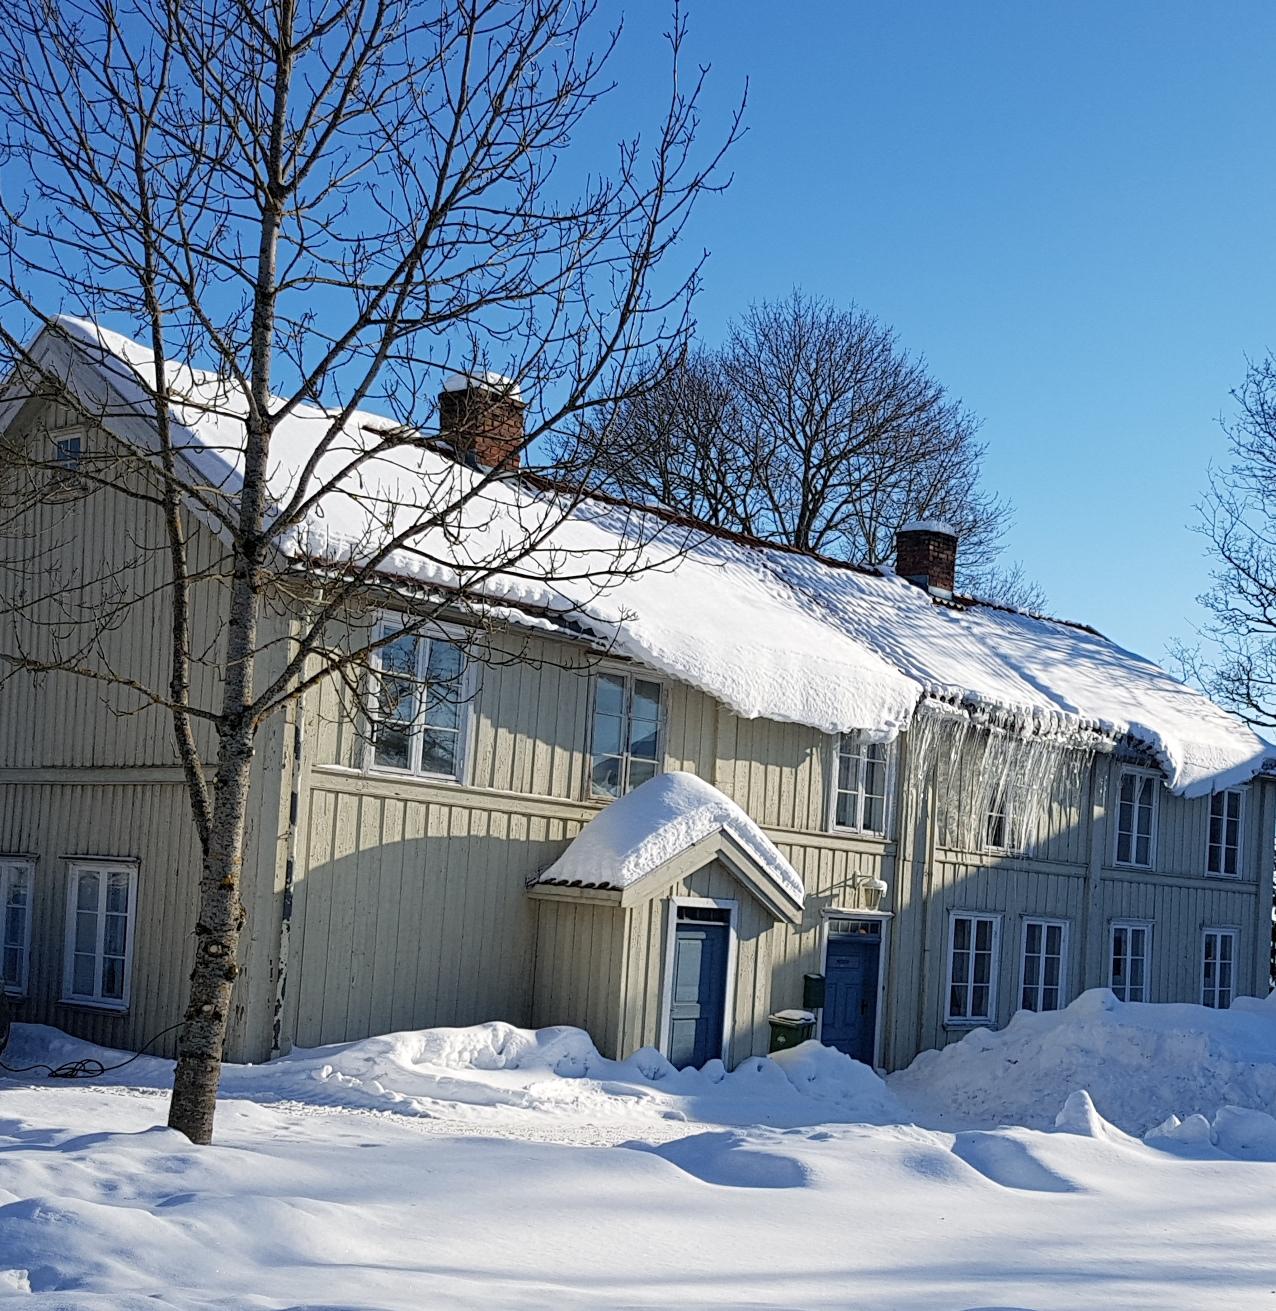 2018-03-rh-vinterhuset.jpg